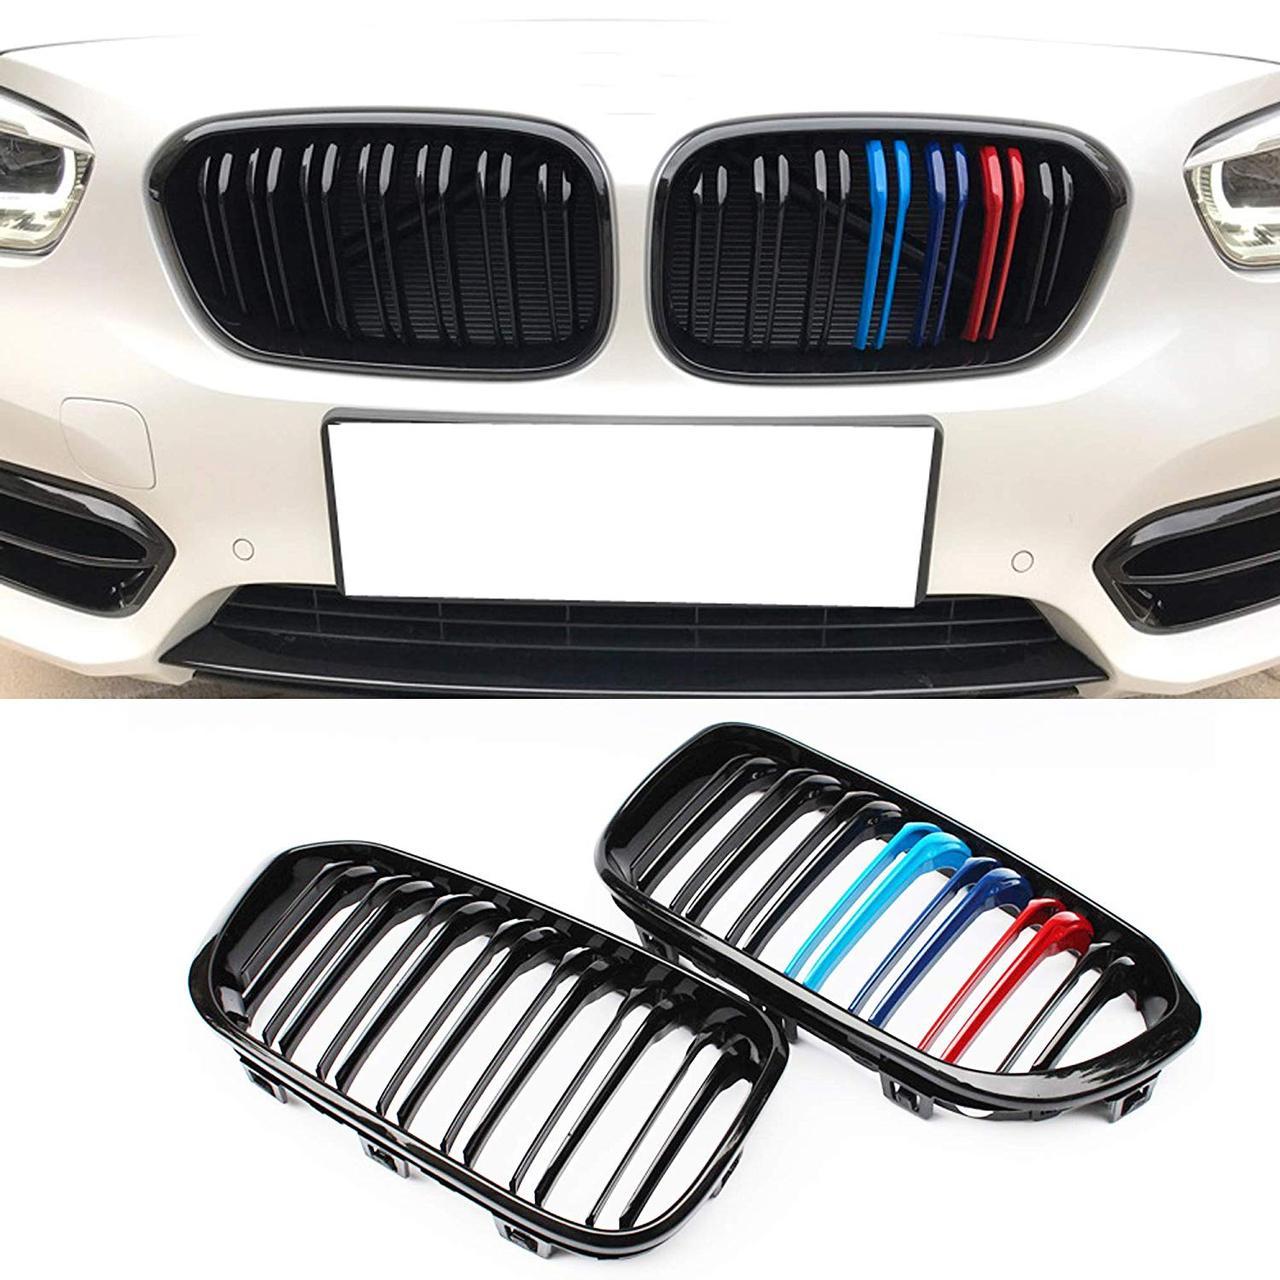 Решетки радиатора ноздри BMW F20 F21 (15-18) в стиле M1 (глянц + колор)